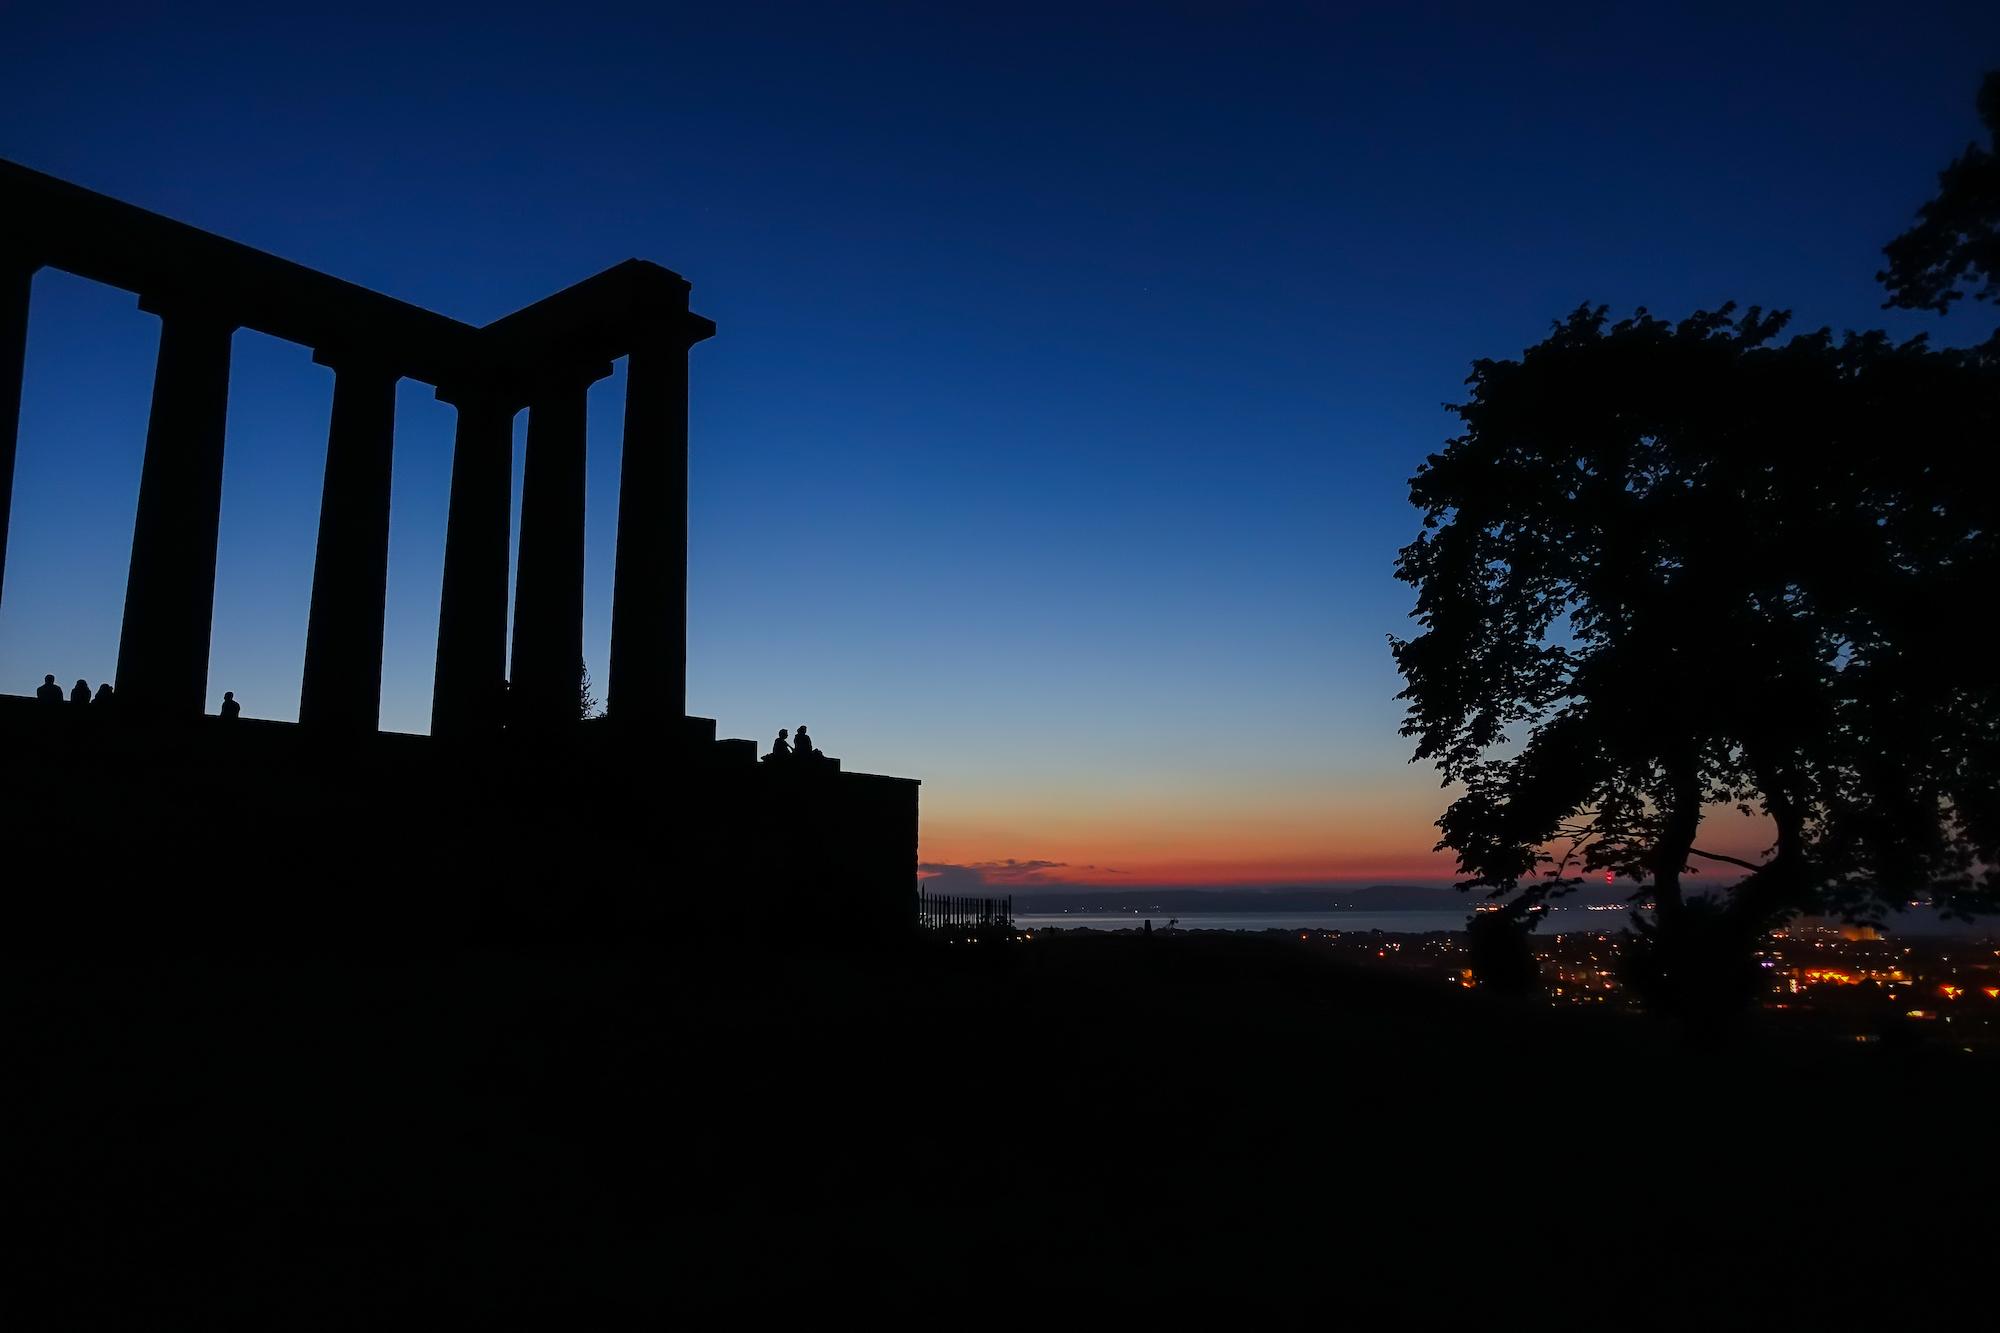 (238) Watching the sun go down over Edinburgh, The National Monument of Scotland, Calton Hill, Edinburgh, Scotland.jpg